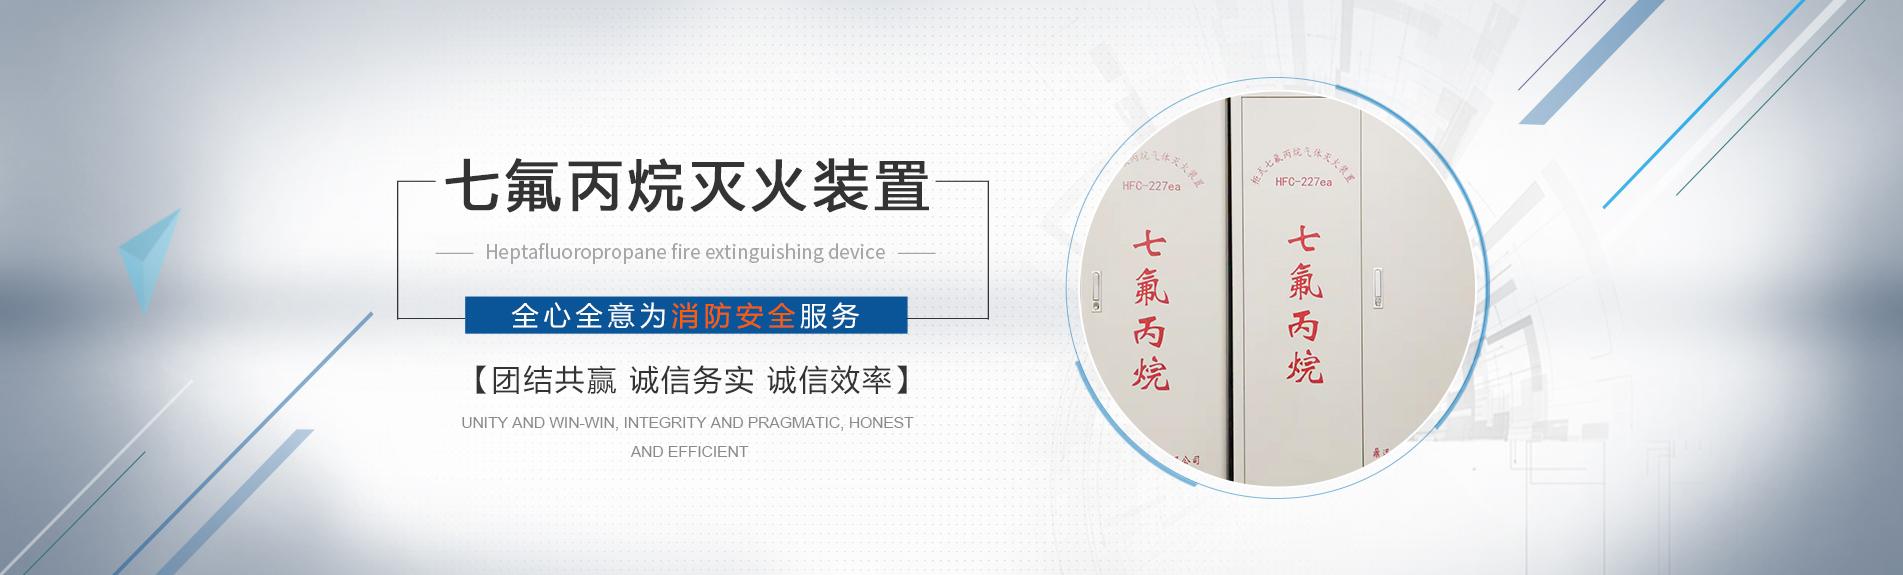 Shanghai Jigao Fire Safety Technology Co., Ltd.